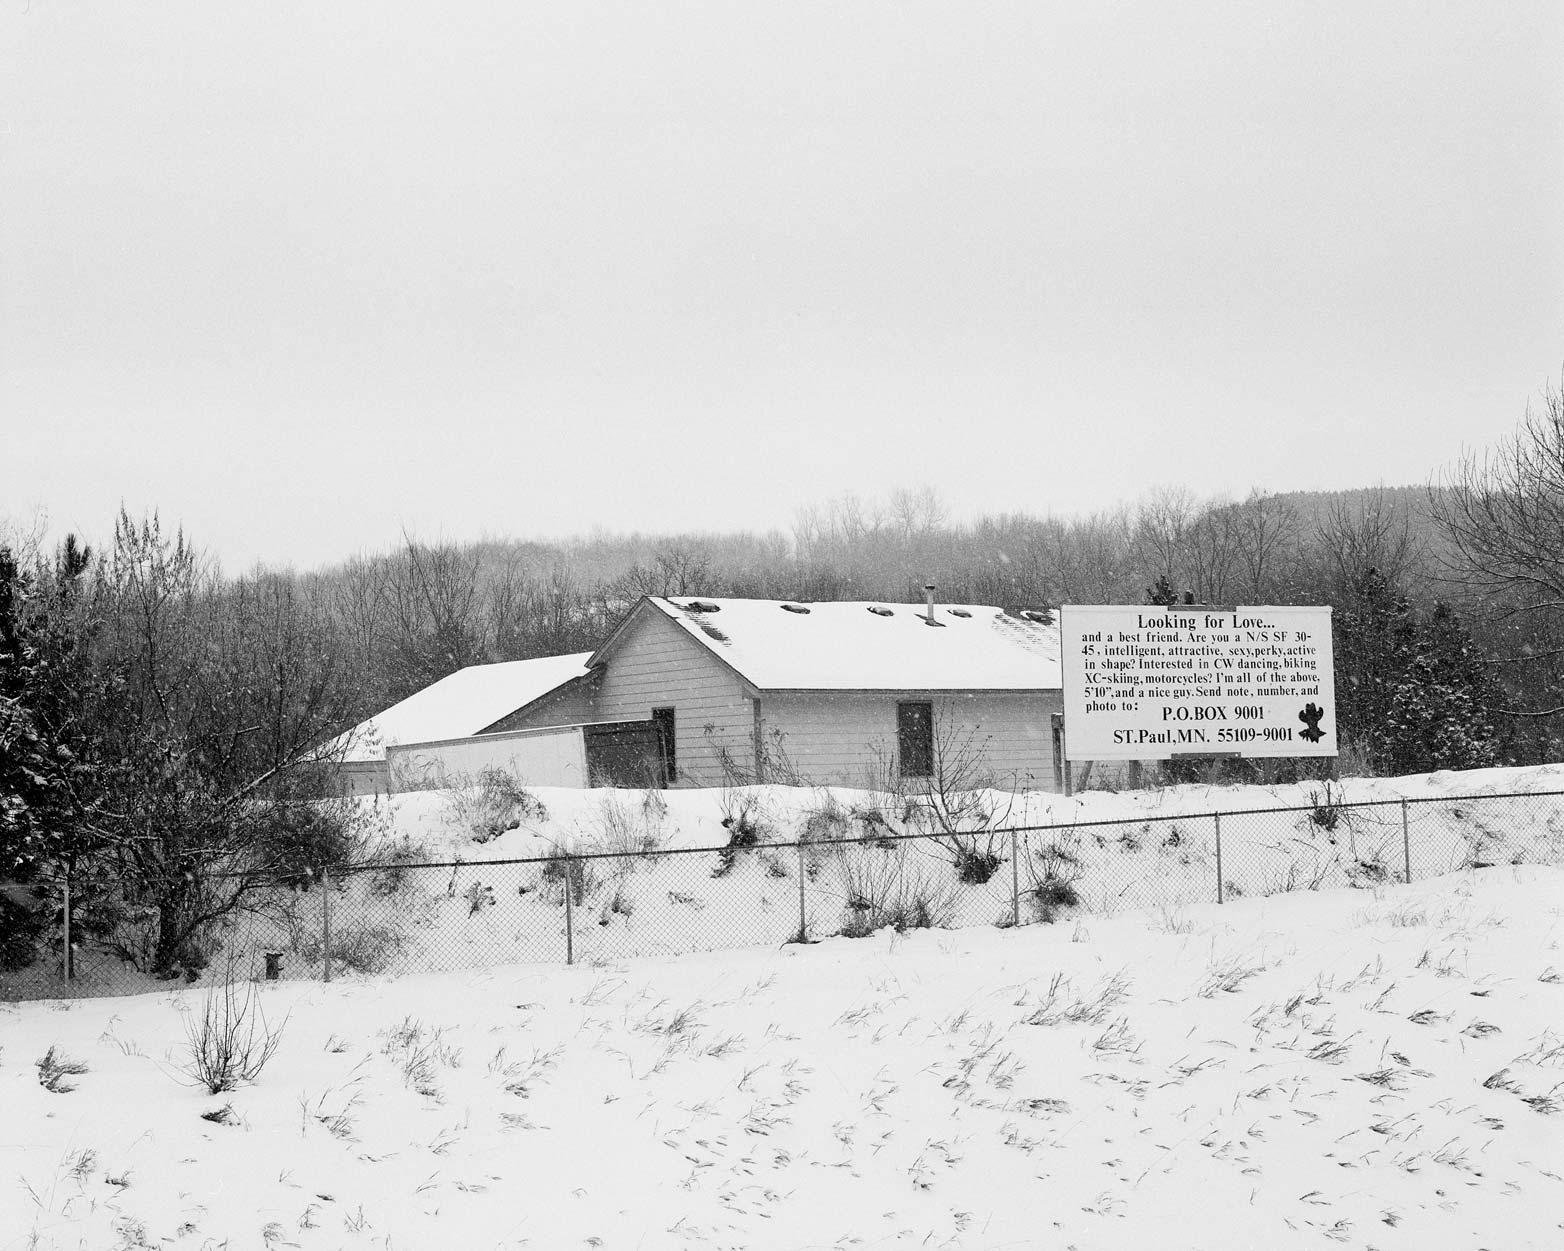 Looking for Love. Woodbury, Minnesota